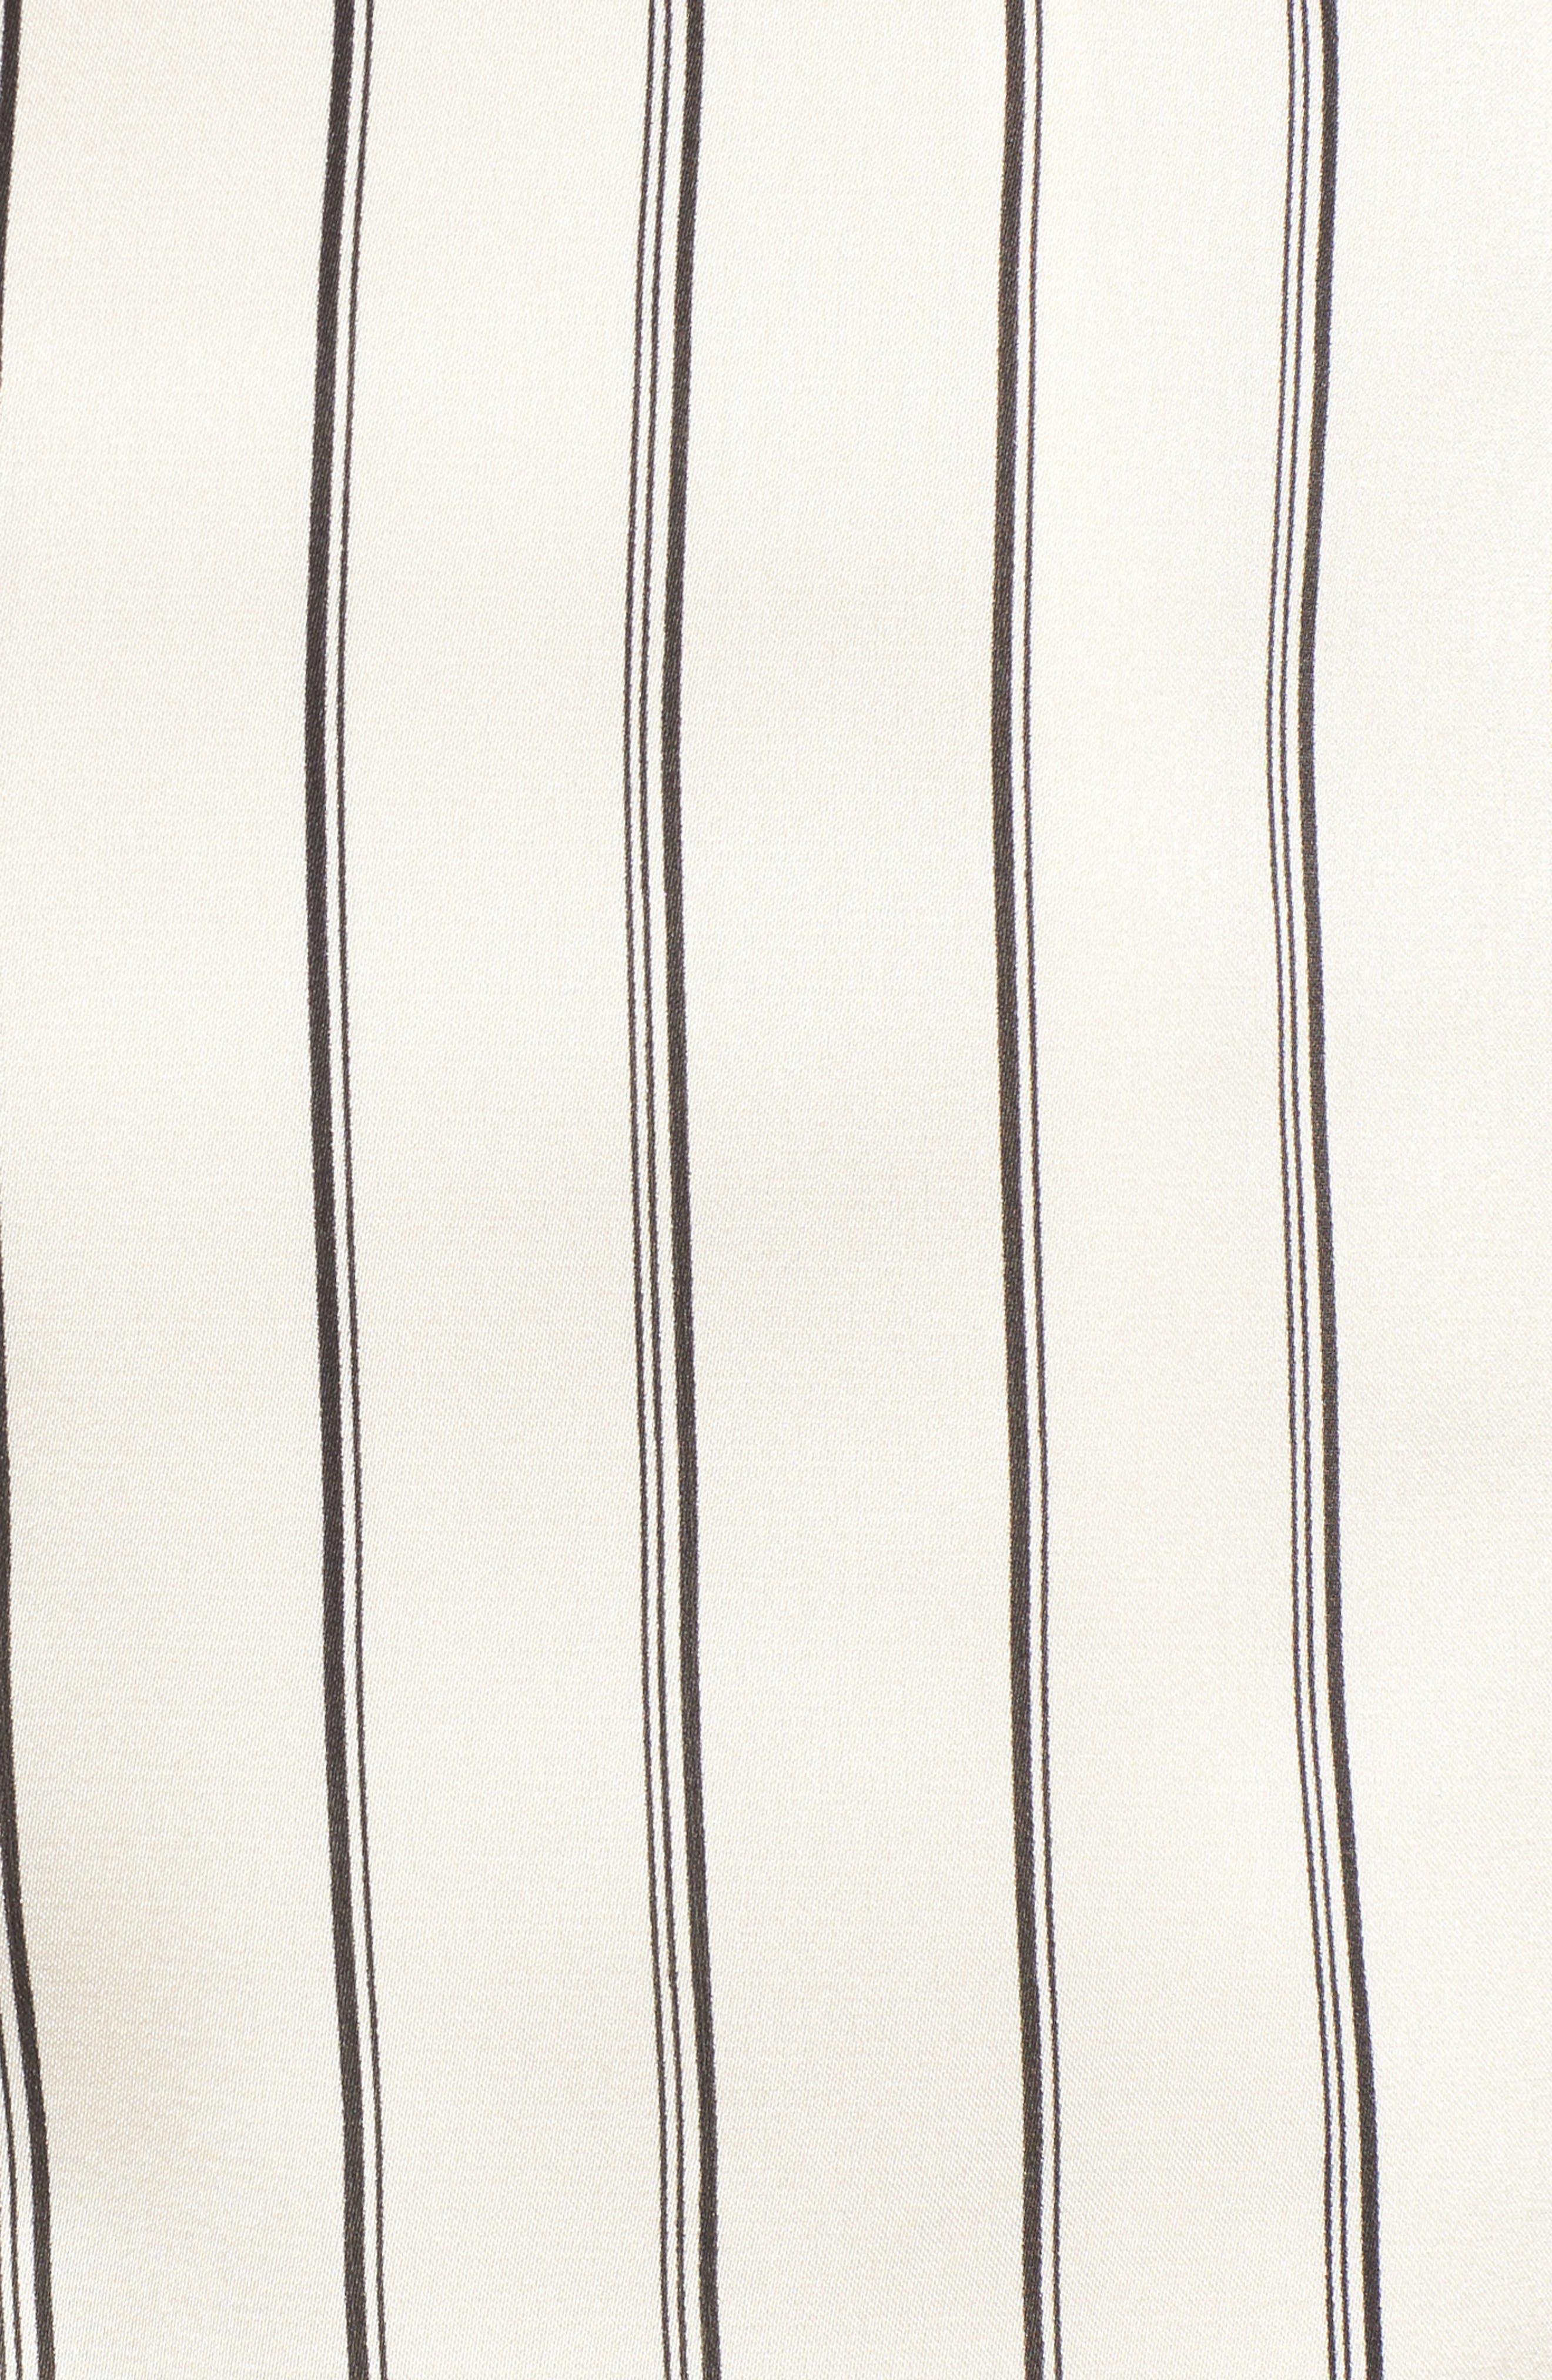 Ruffle Pinstripe Skirt,                             Alternate thumbnail 5, color,                             902